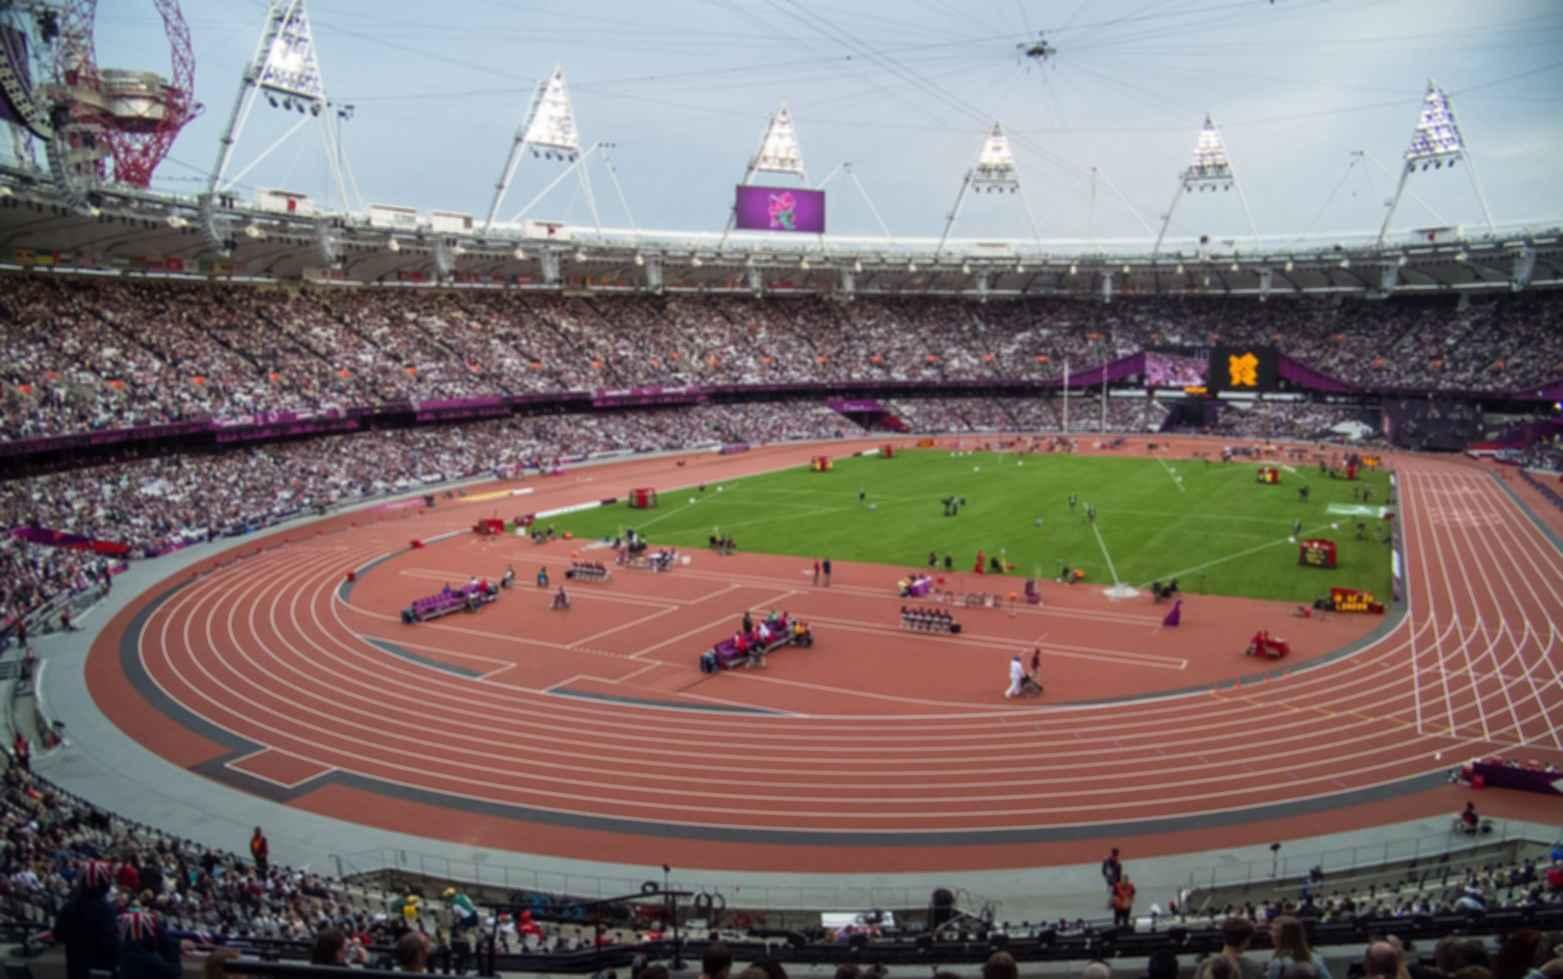 London Olympic Stadium - Inside the Stadium